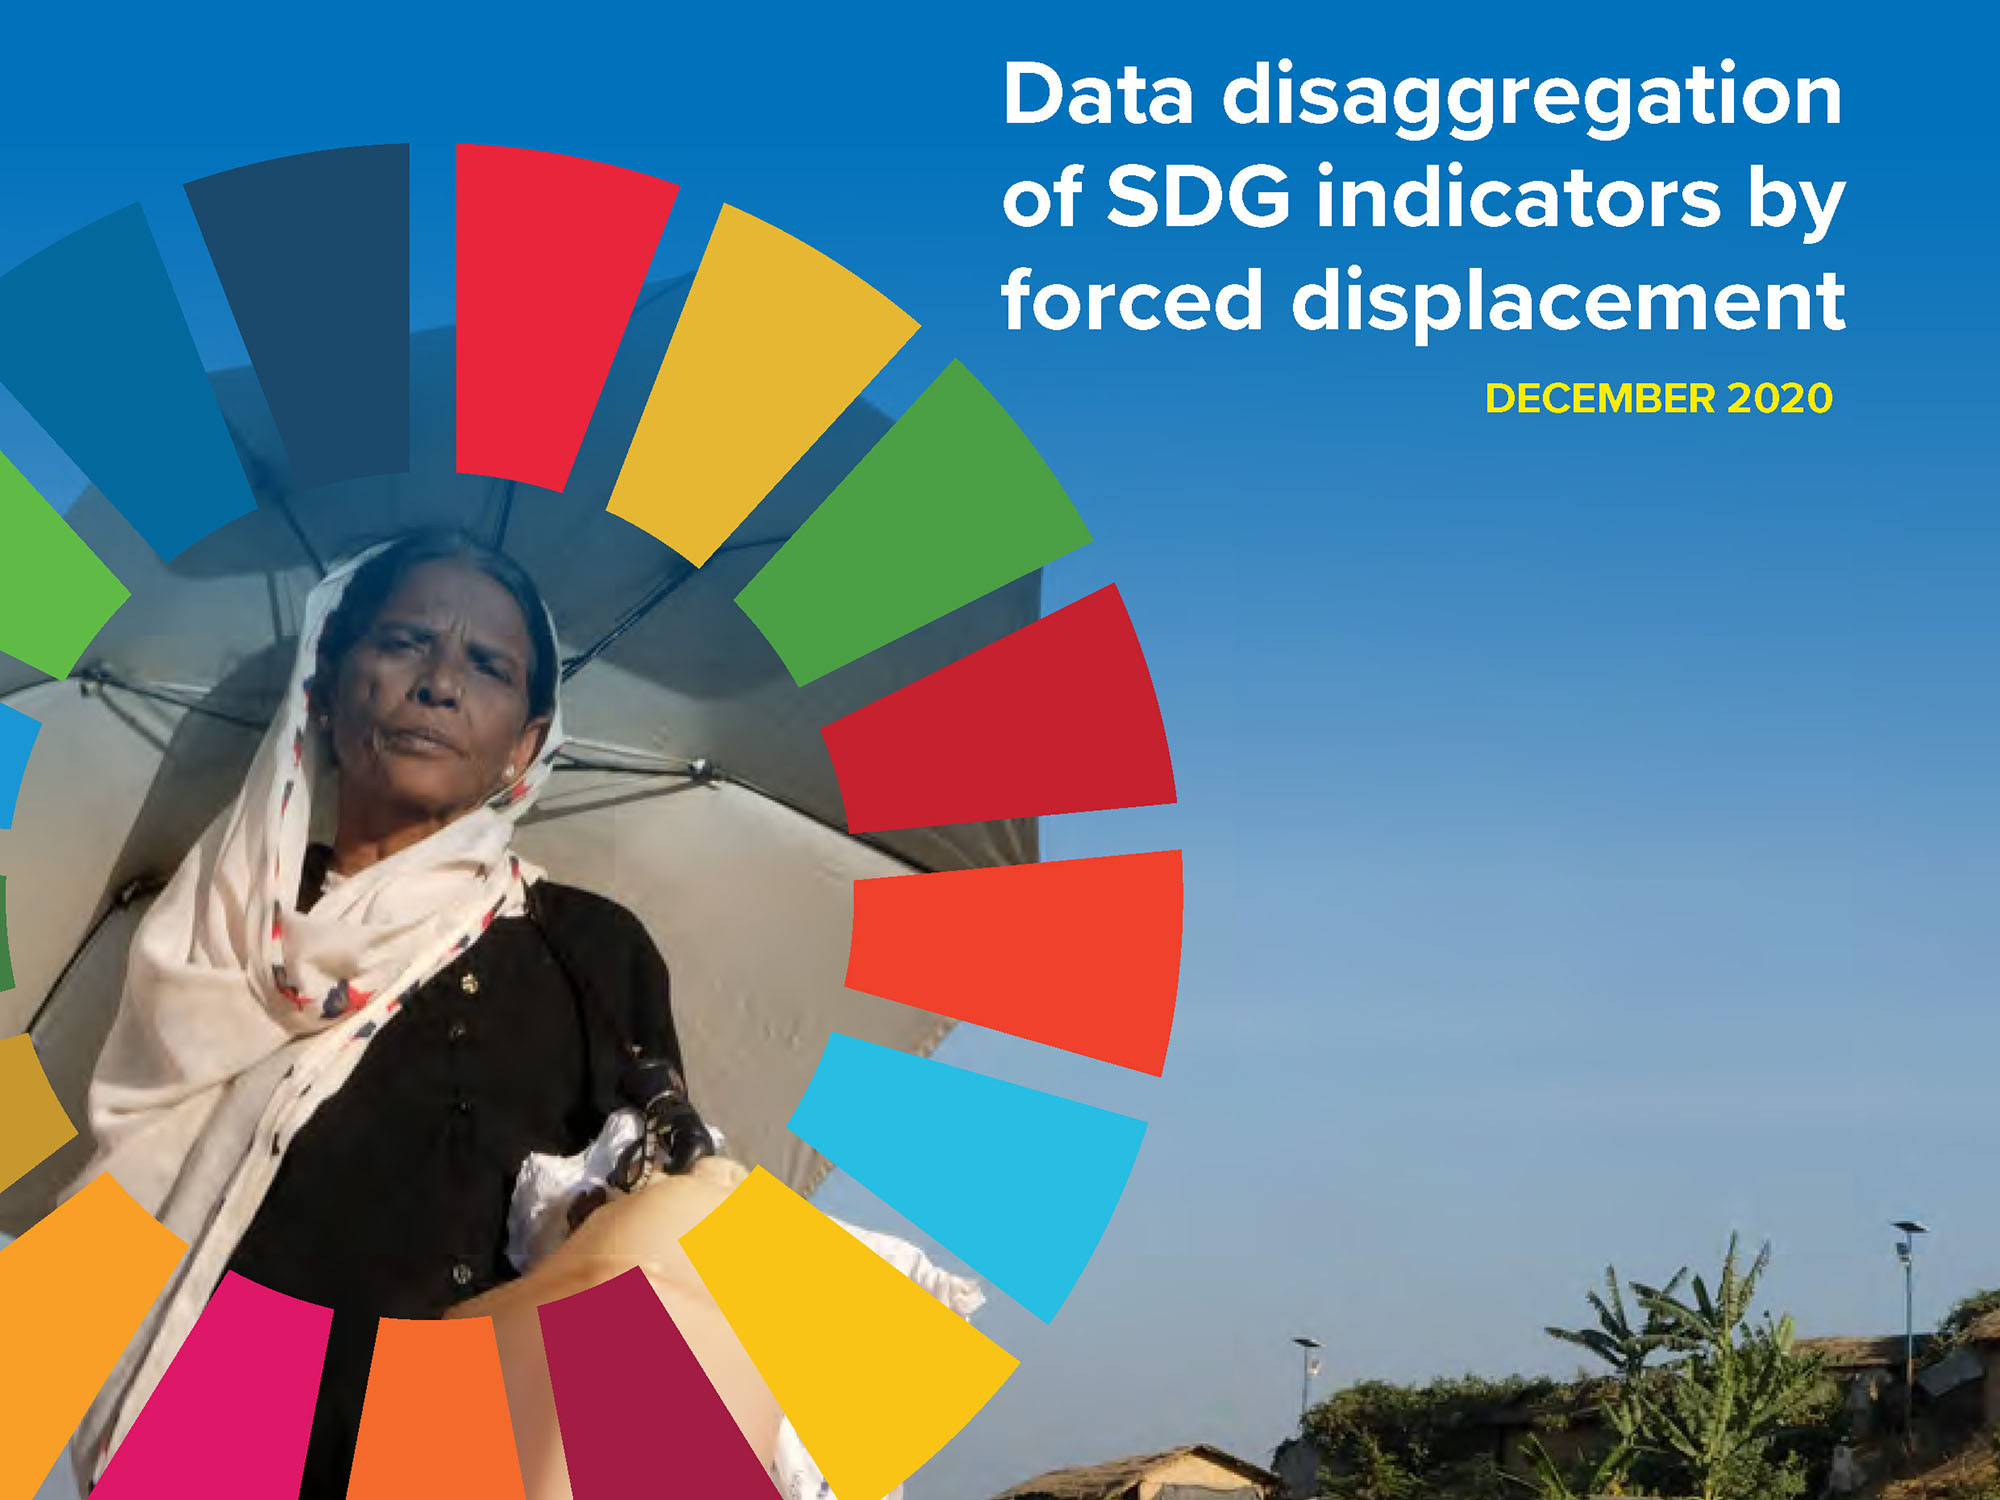 UNHCR-JIPS-IAEGSDGs-DataDisaggregation-SDGindicators-displacement-Dec2020-2x1.5